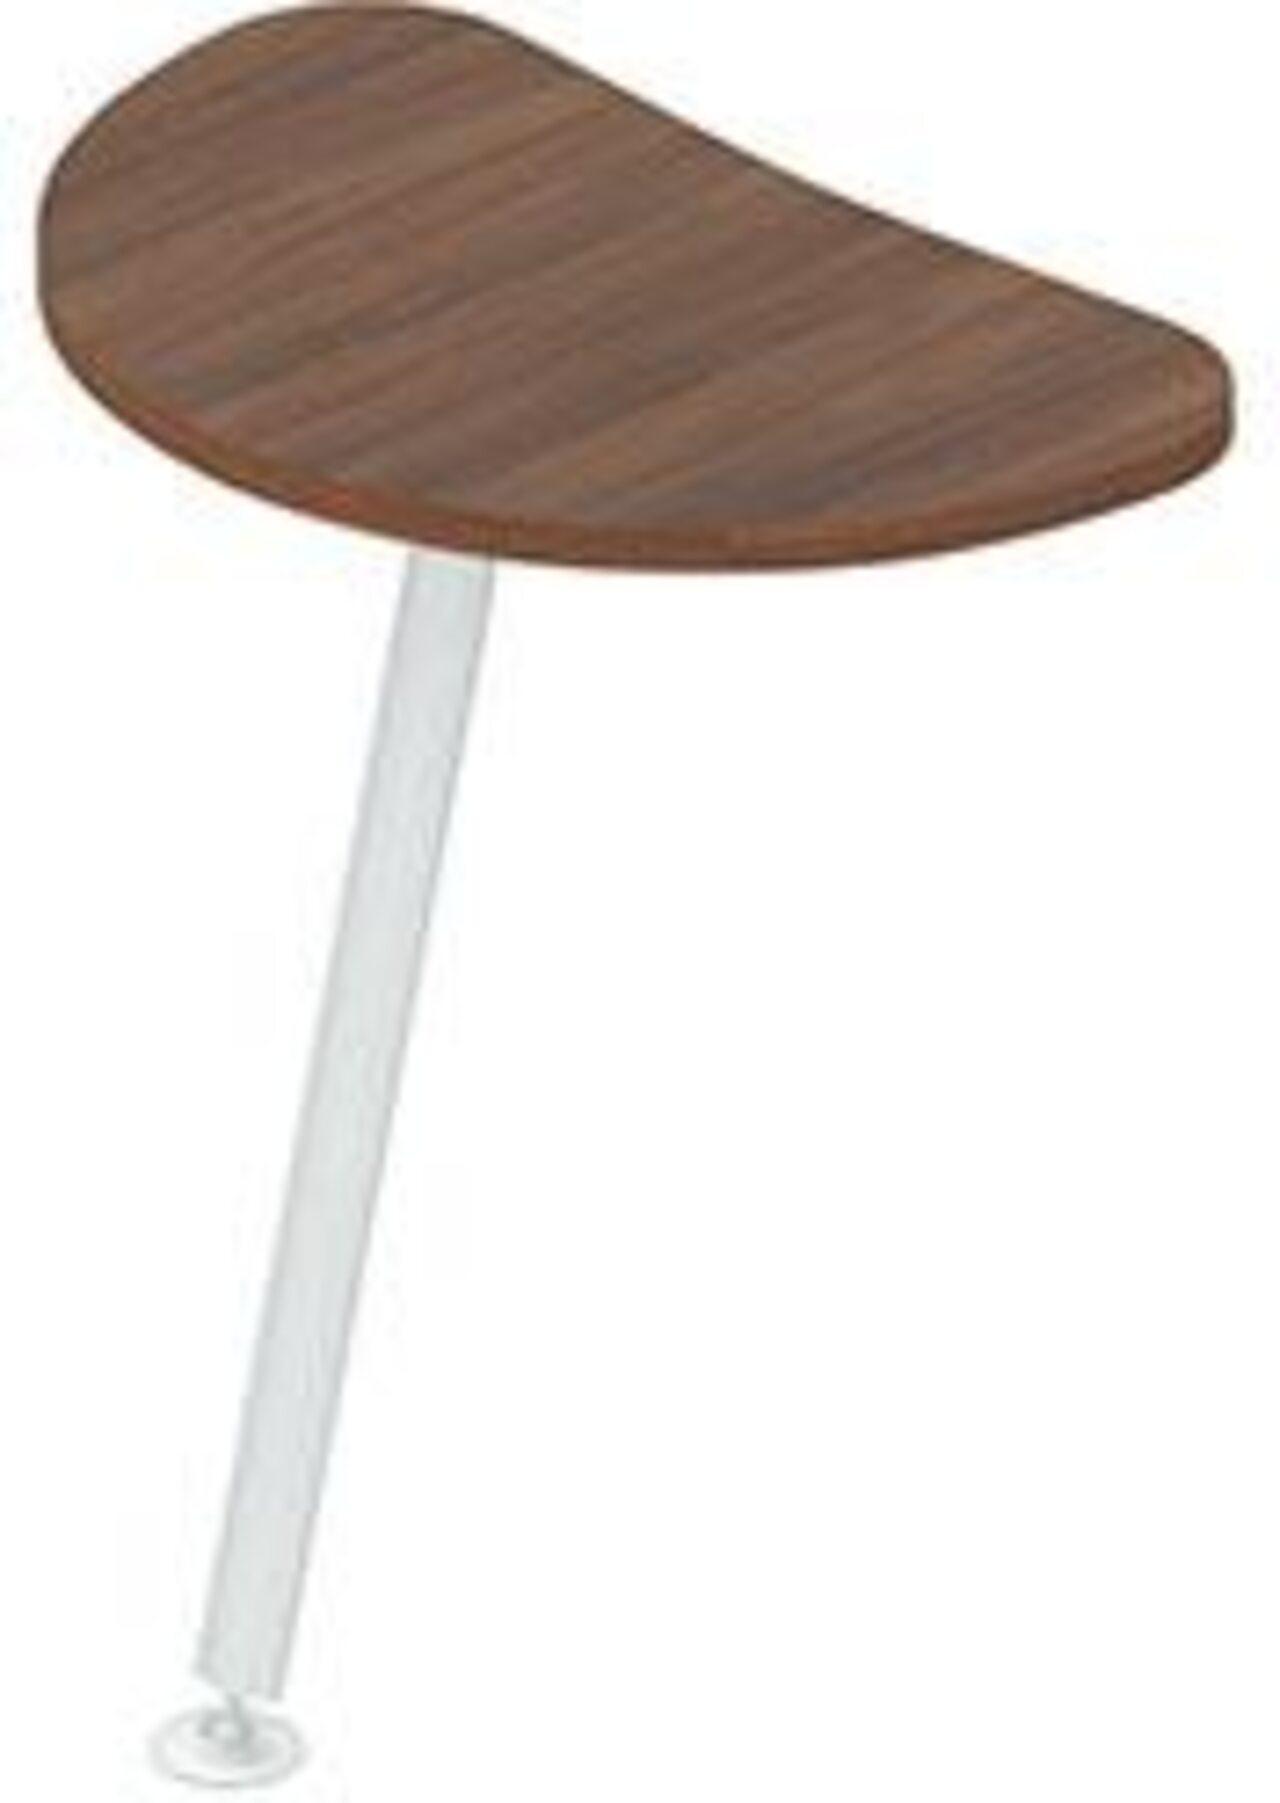 Приставка для криволинейных столов  Gamma (Гамма) 44x69x3 - фото 1